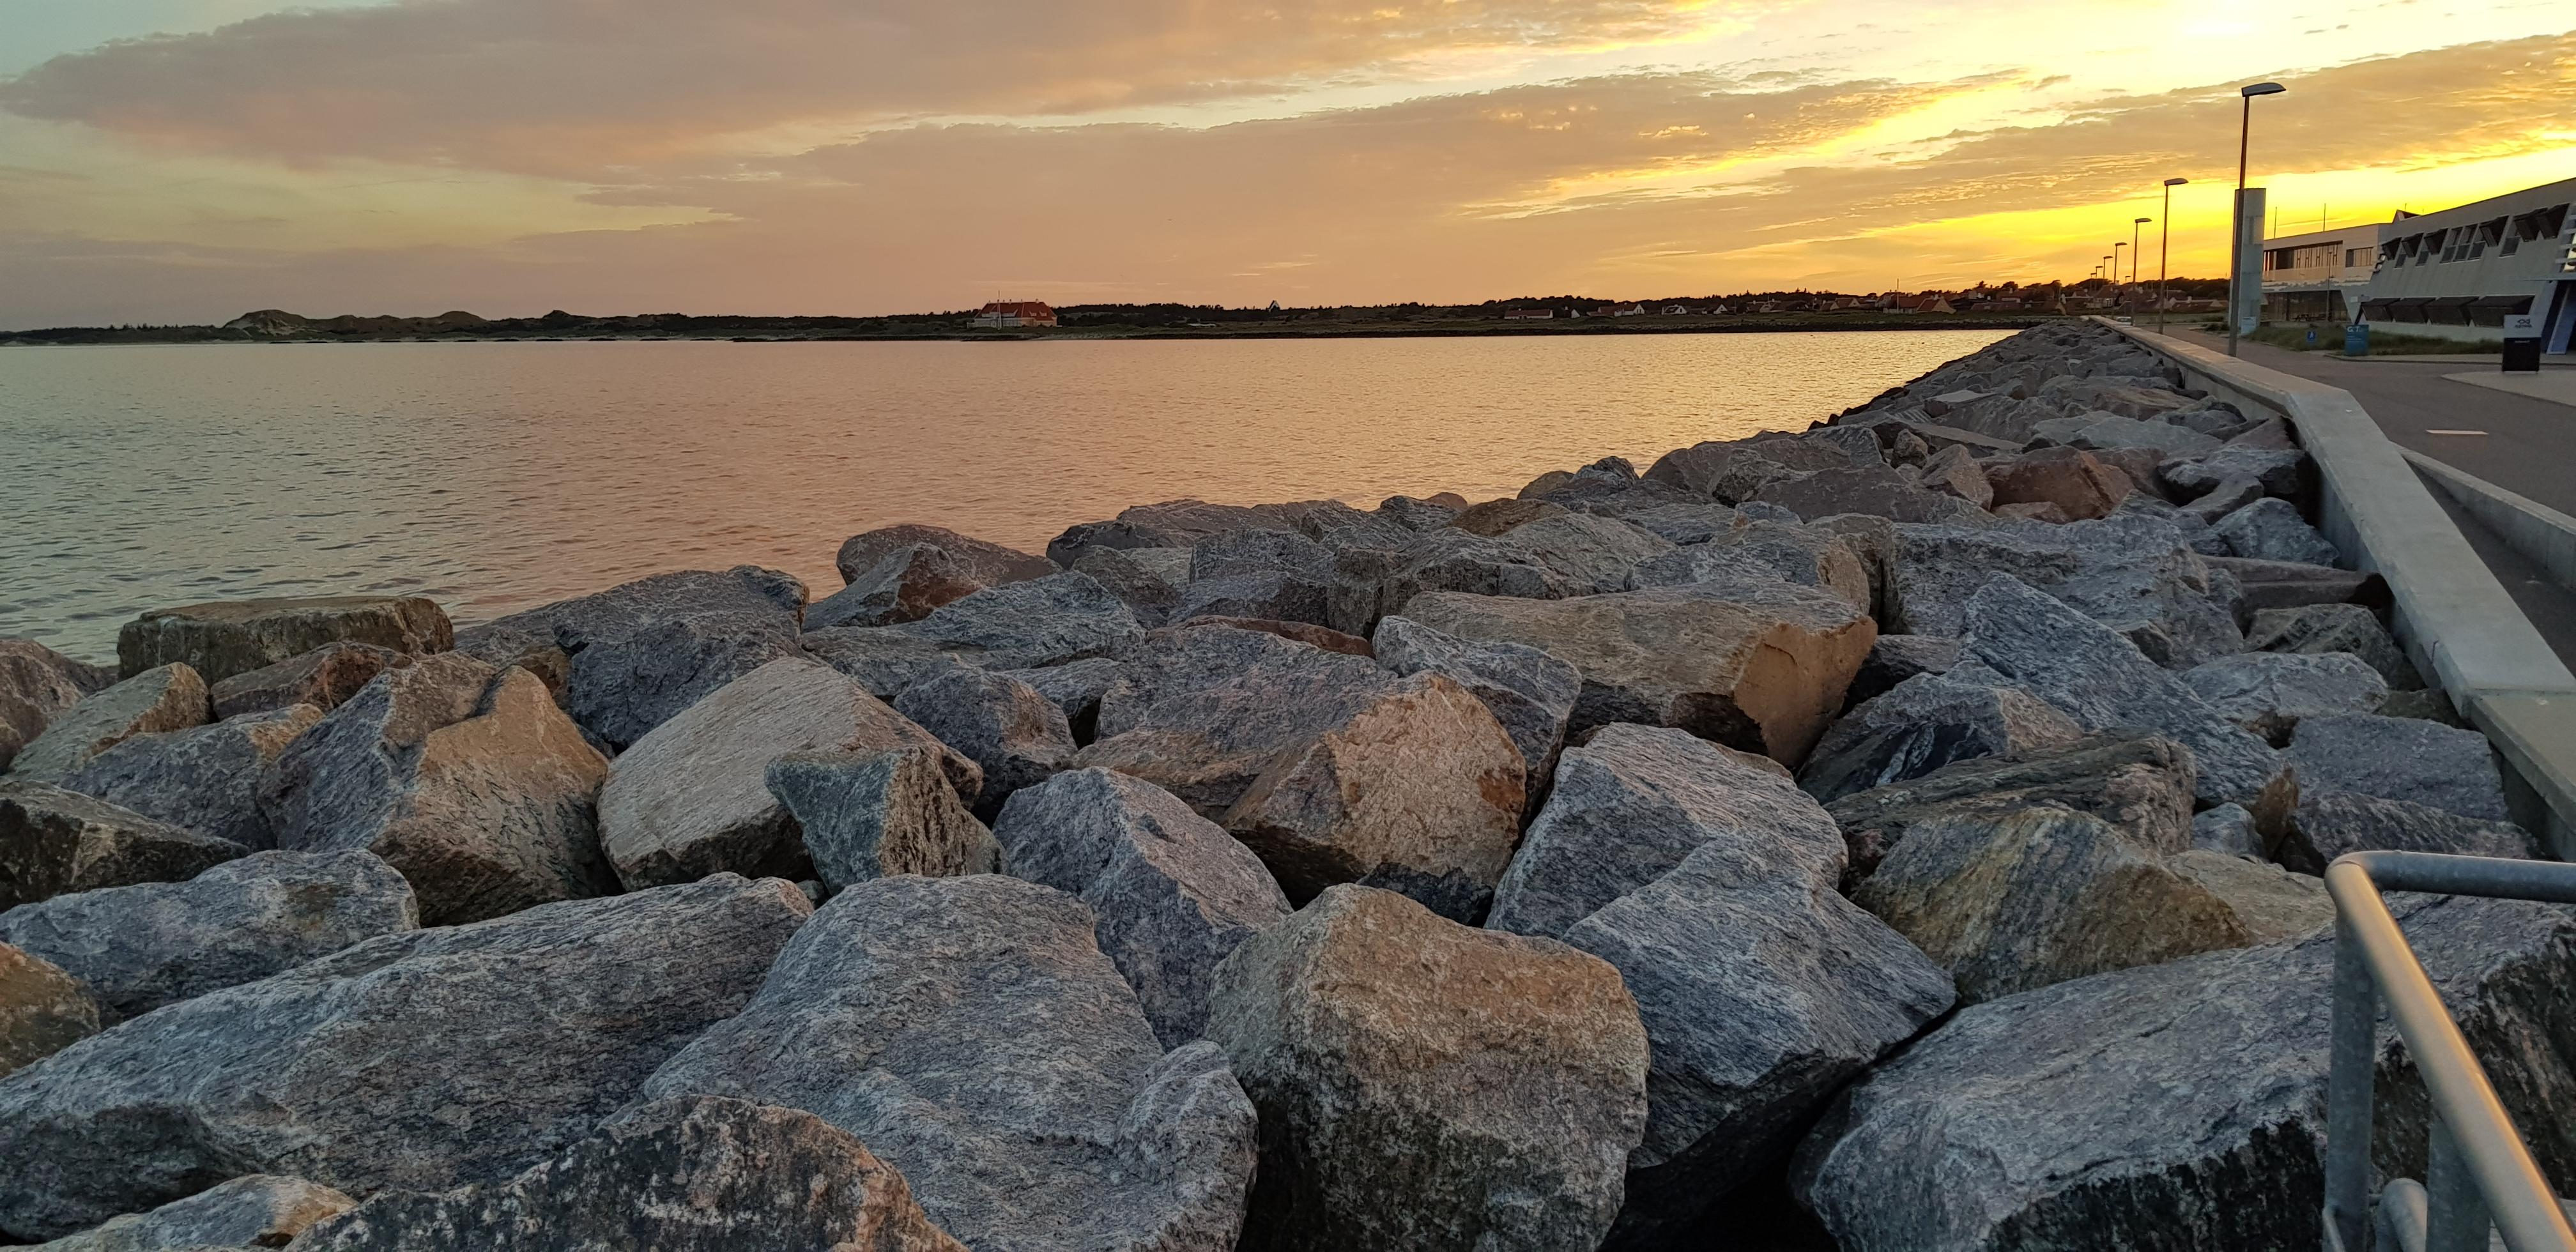 Molen ved Skagen Havn